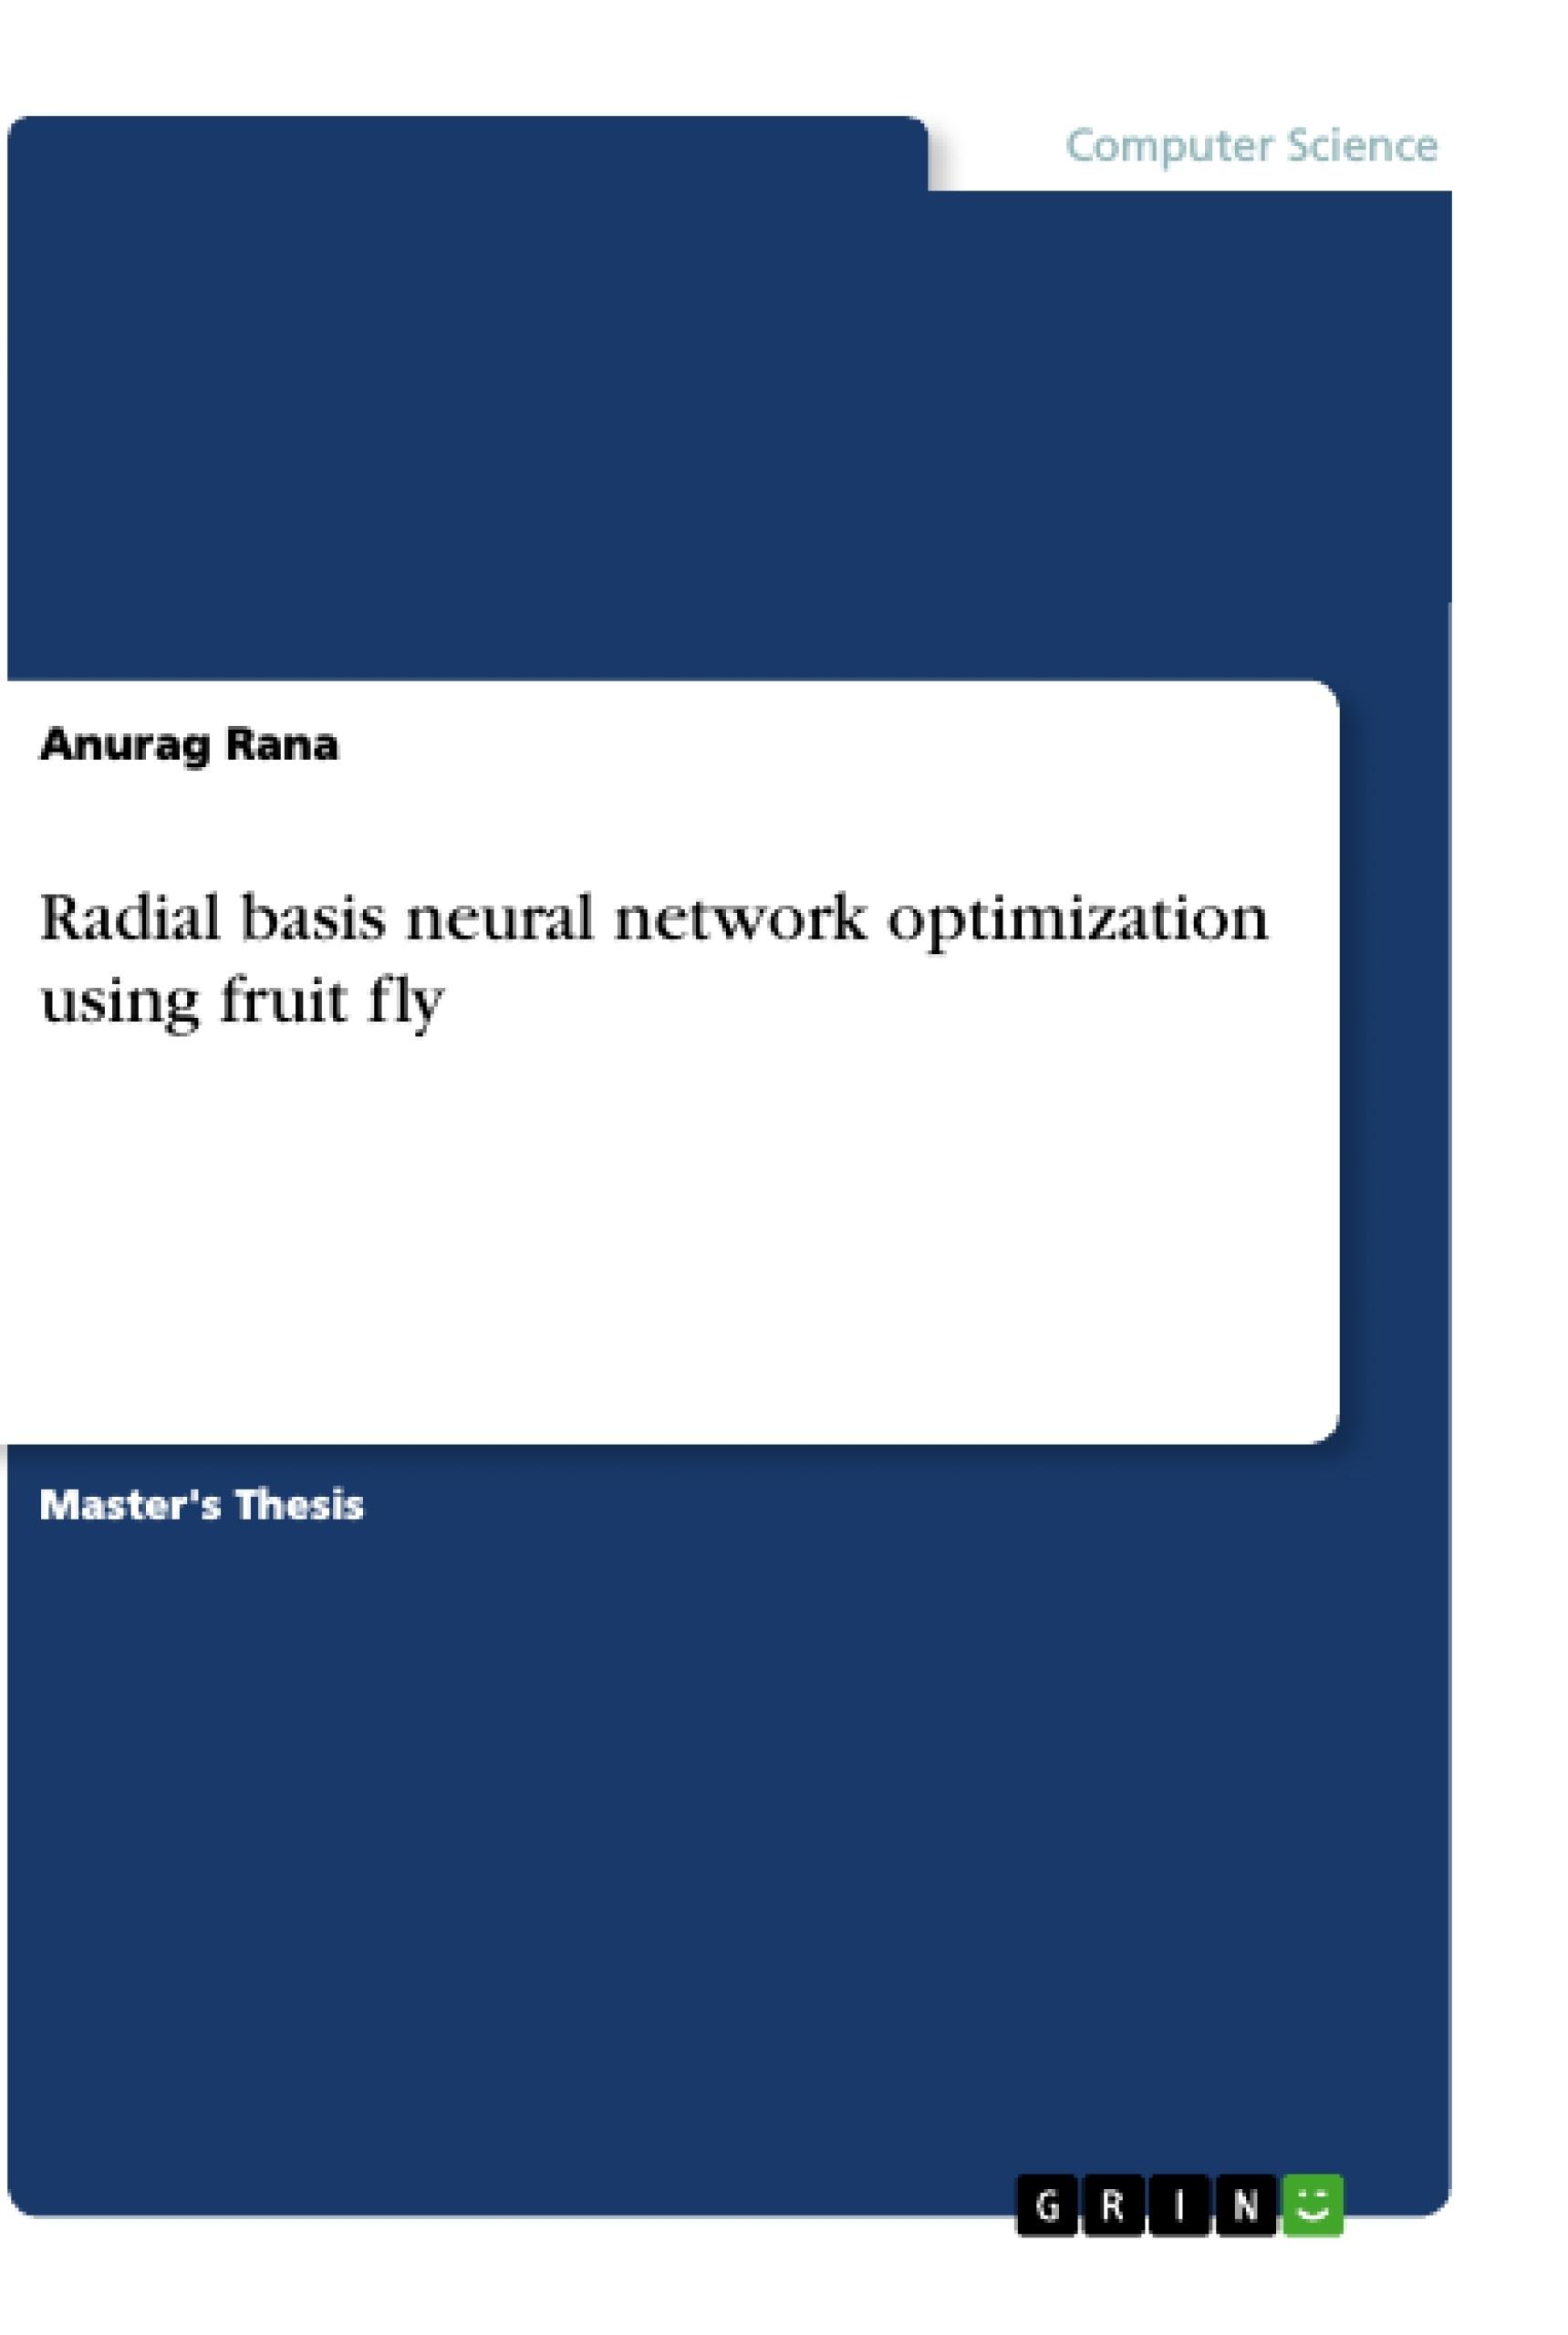 Title: Radial basis neural network optimization using fruit fly